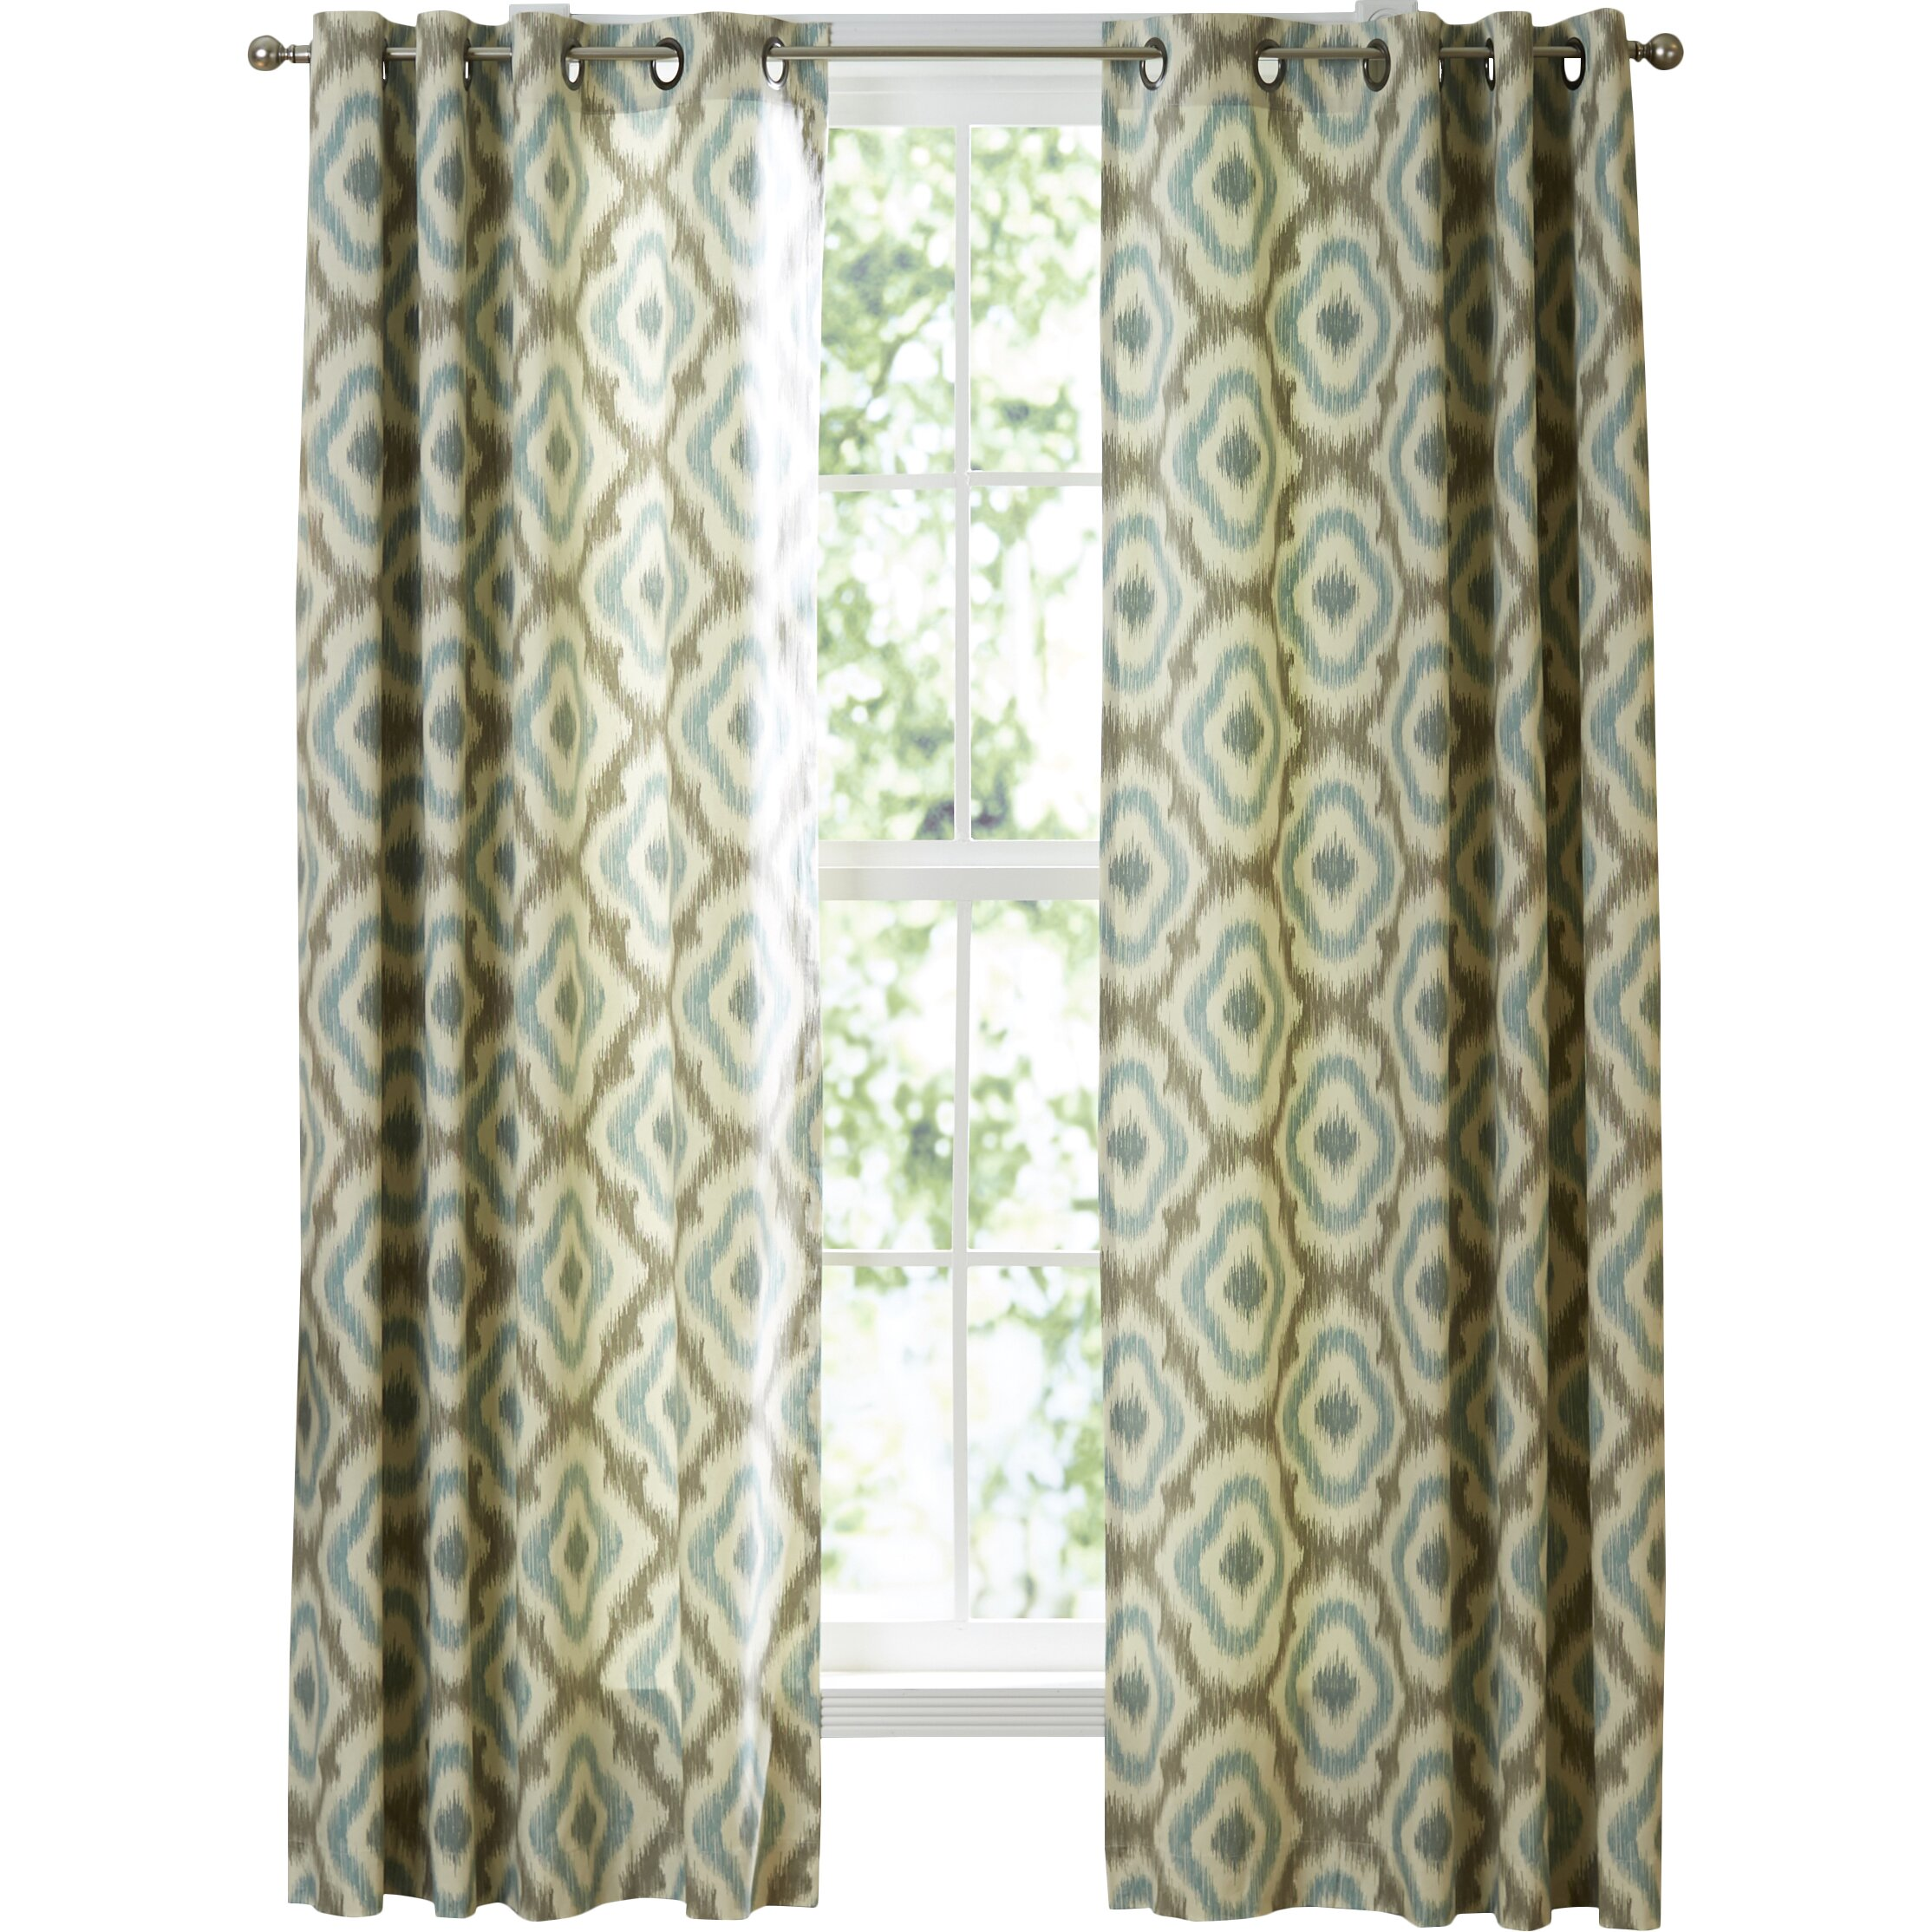 How to make tie top curtains - Ankara Single Curtain Panel